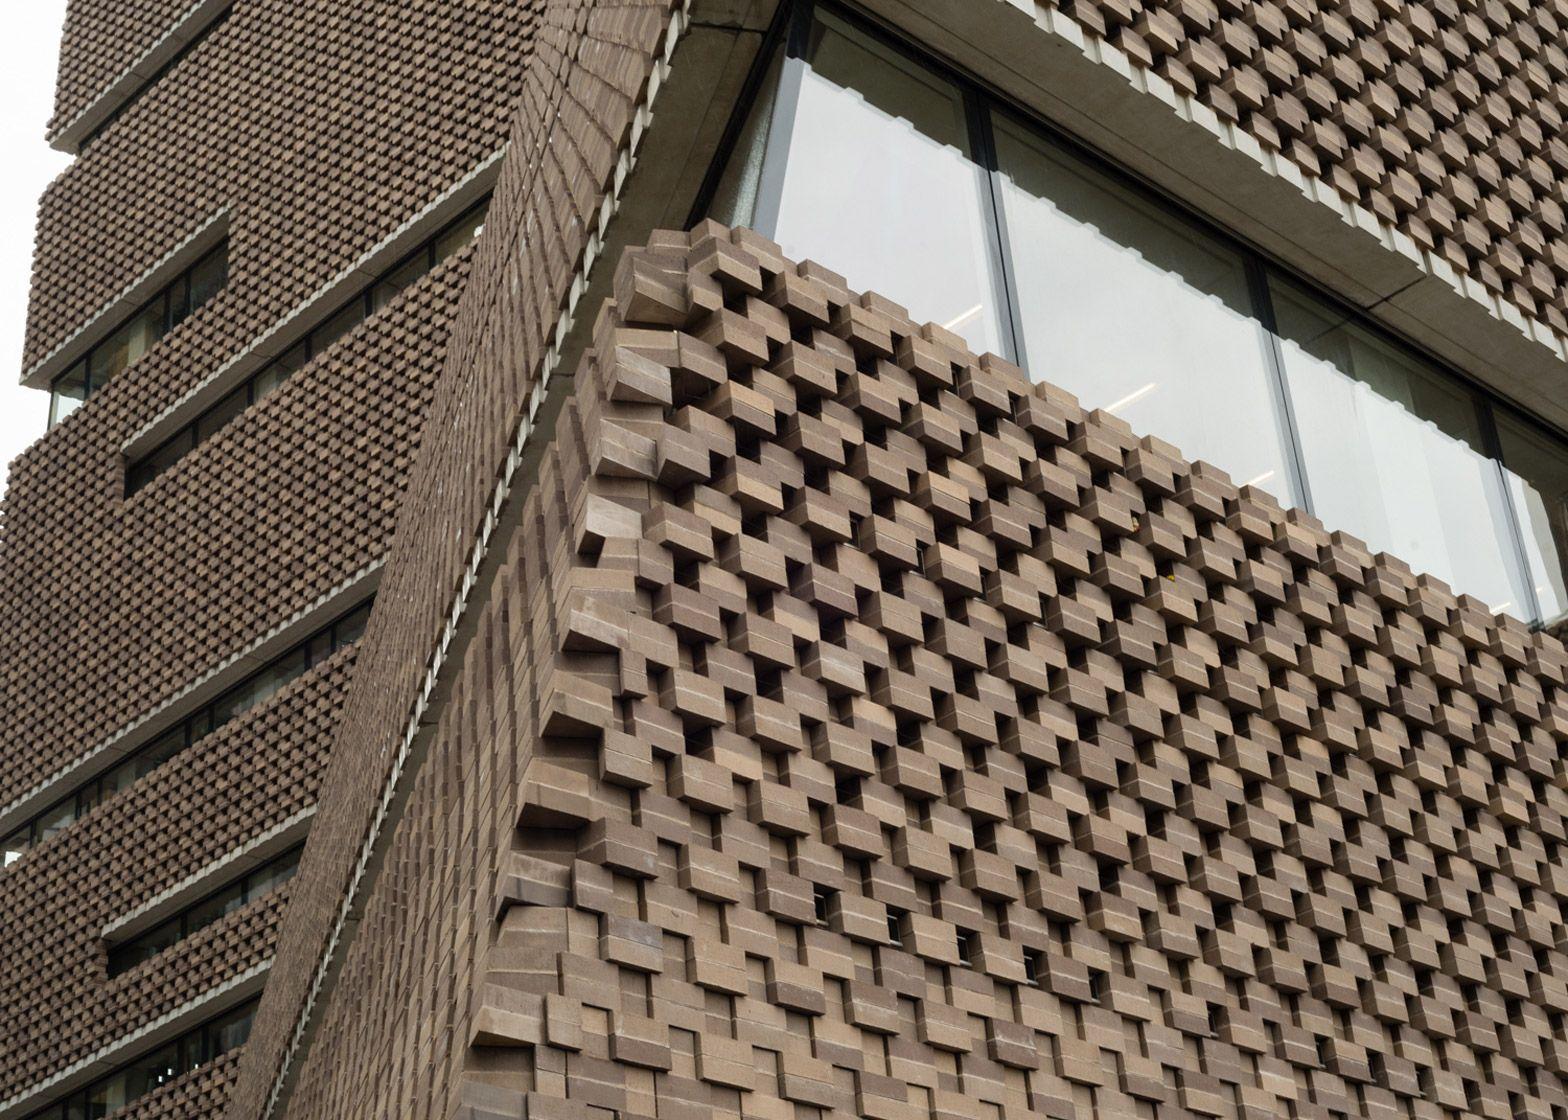 Switch House By Herzog De Meuron Features An Exterior Of Latticed Brickwork Switch House Tate Modern Tate Modern Extension